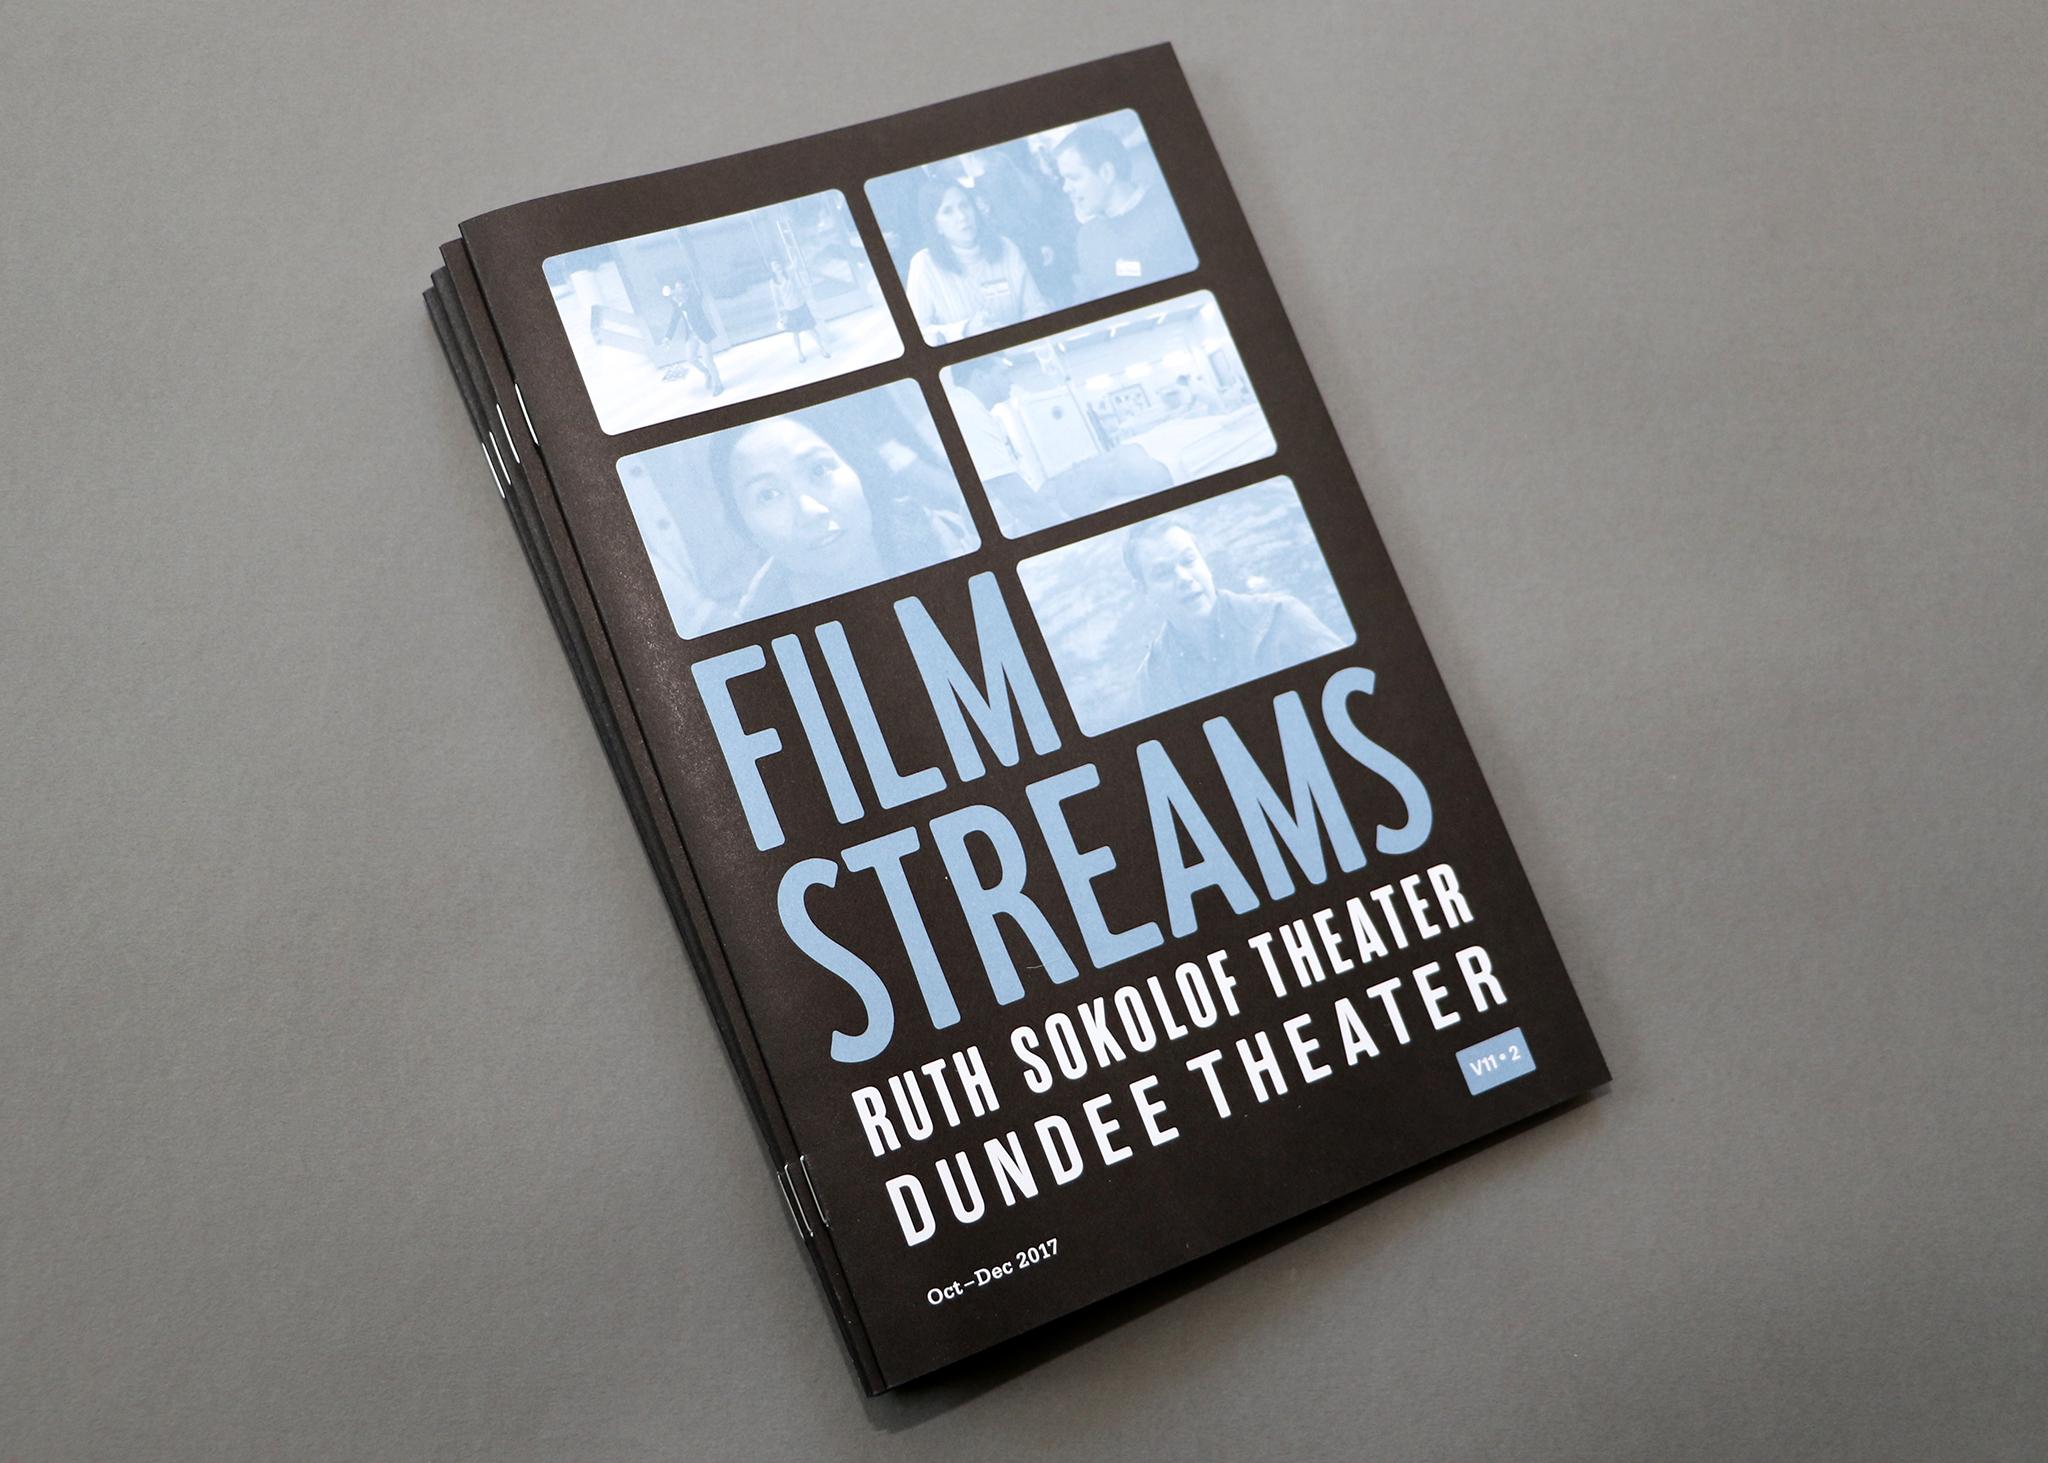 jkdc_filmstreams-newsletter-1.jpg